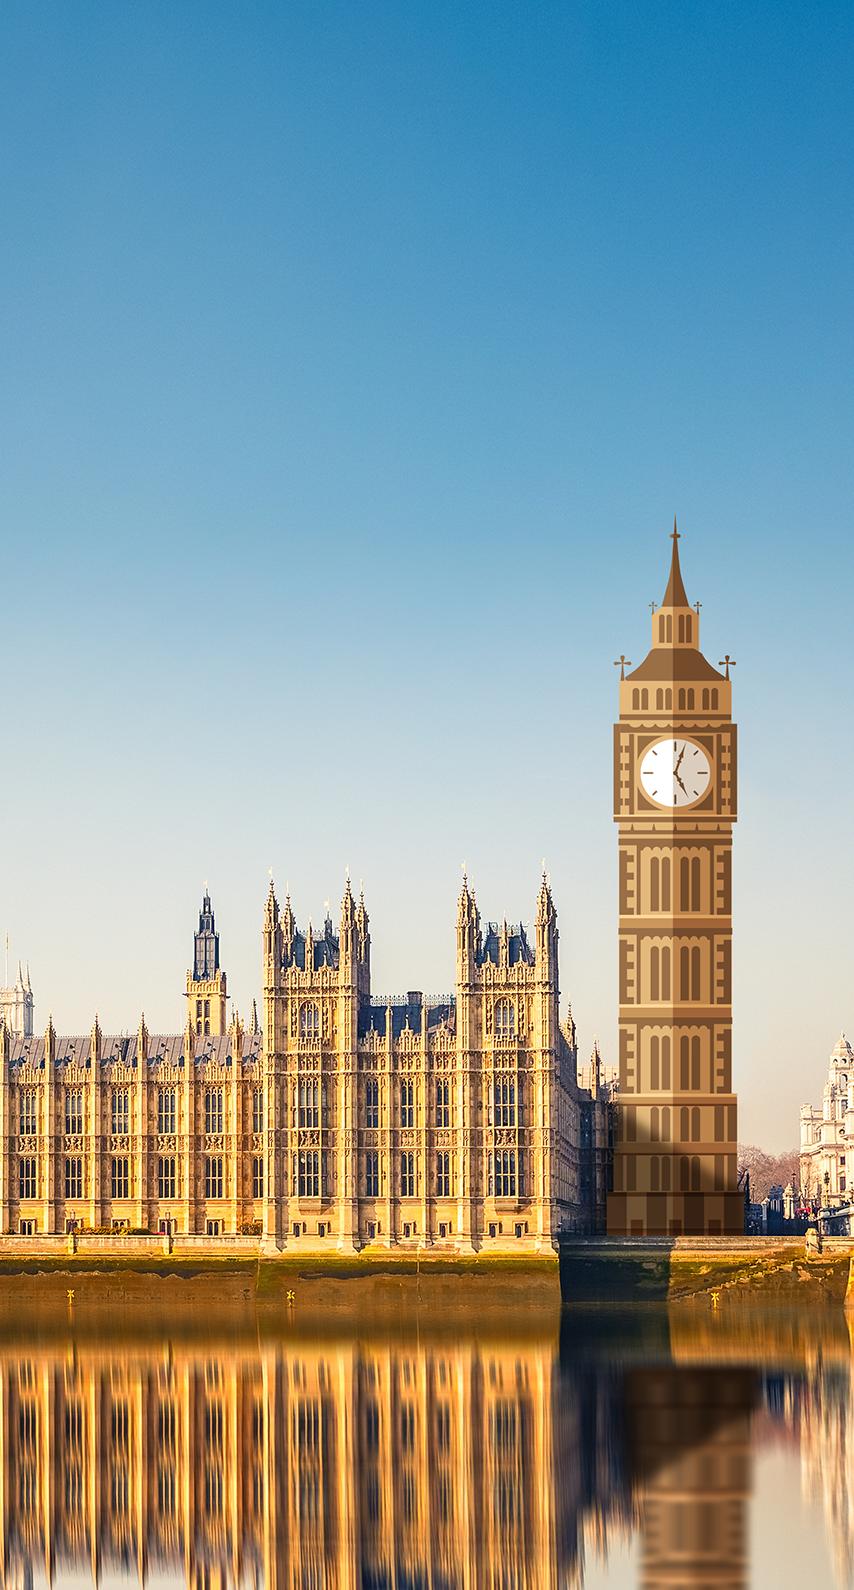 dusk, outdoors, architecture, reflection, building, tower, cityscape, landmark, parliament